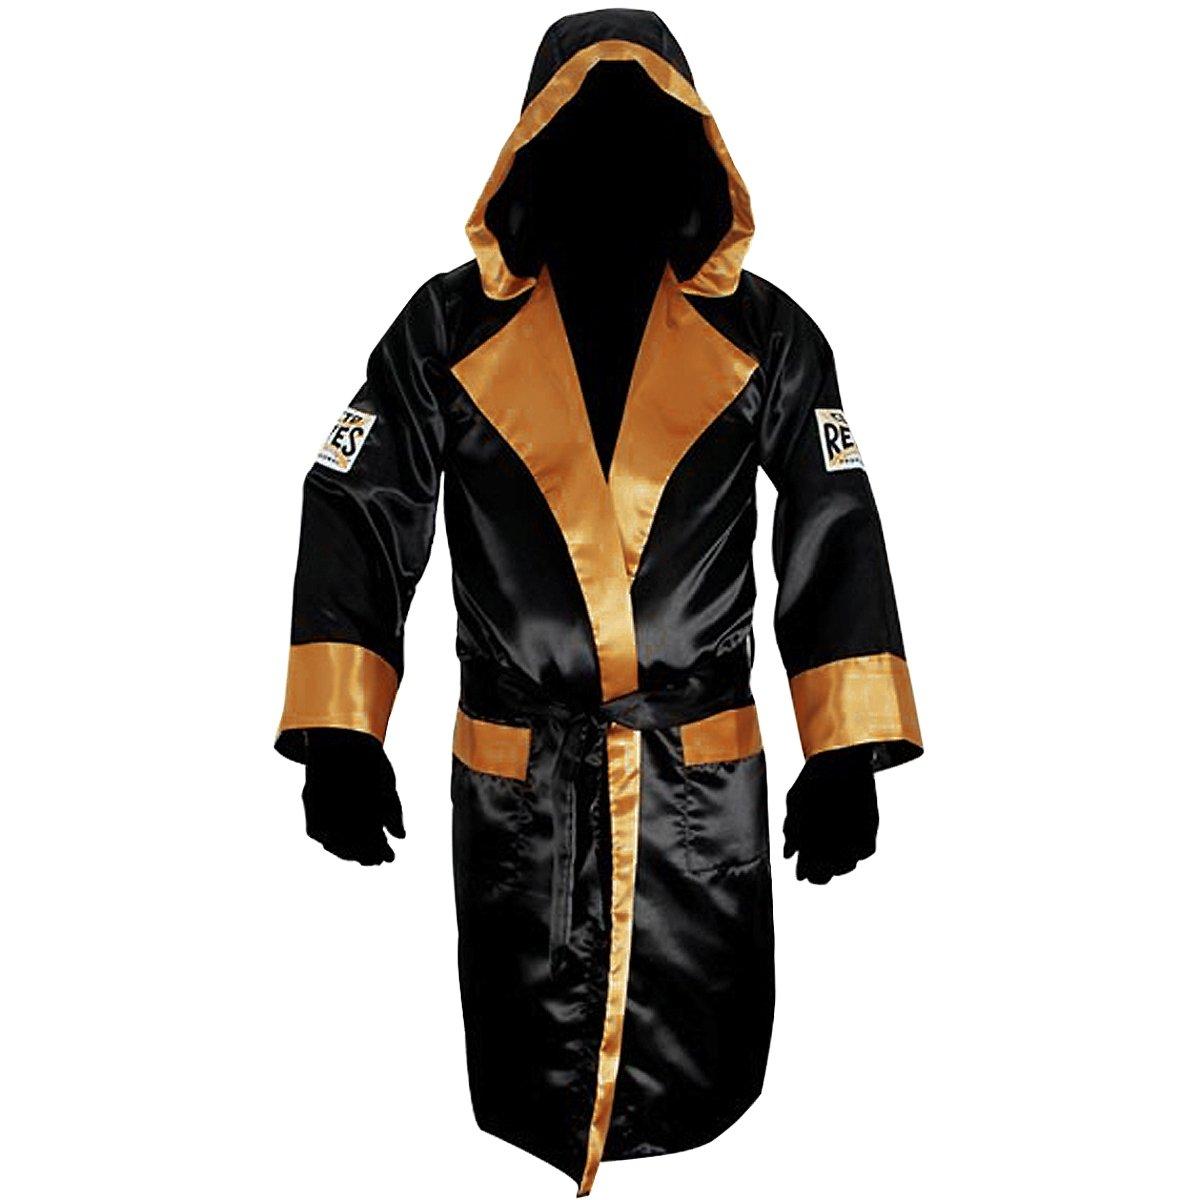 Cleto Reyesサテンボクシングローブwith Hood – ブラック/ゴールド B01BKO5W98  Large